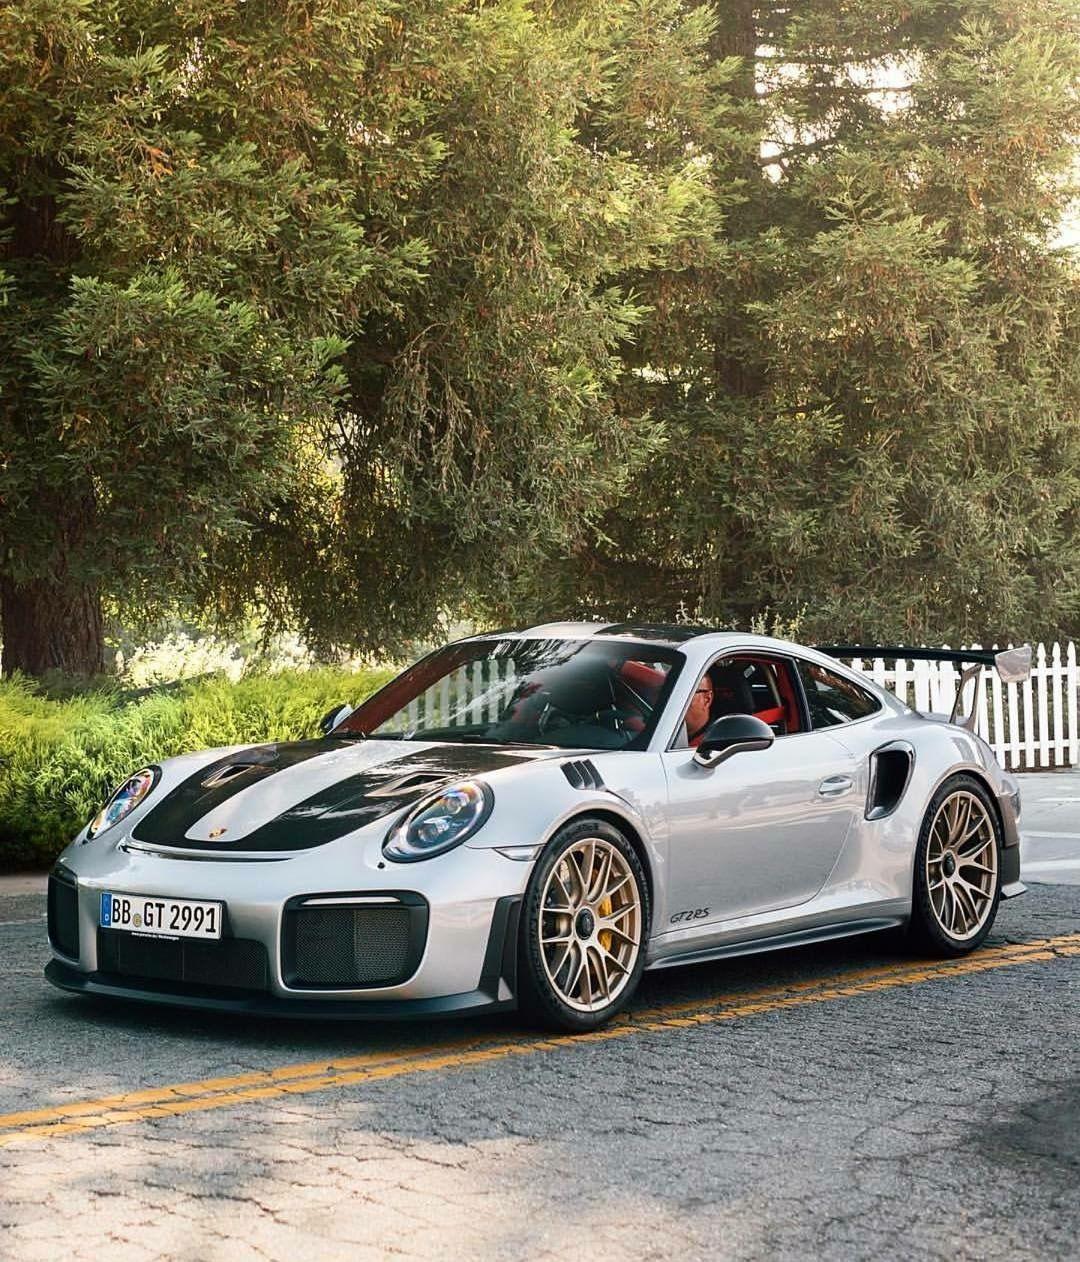 Pin by Zach Lindsay on Stunning cars   Pinterest   Porsche 911 gt2